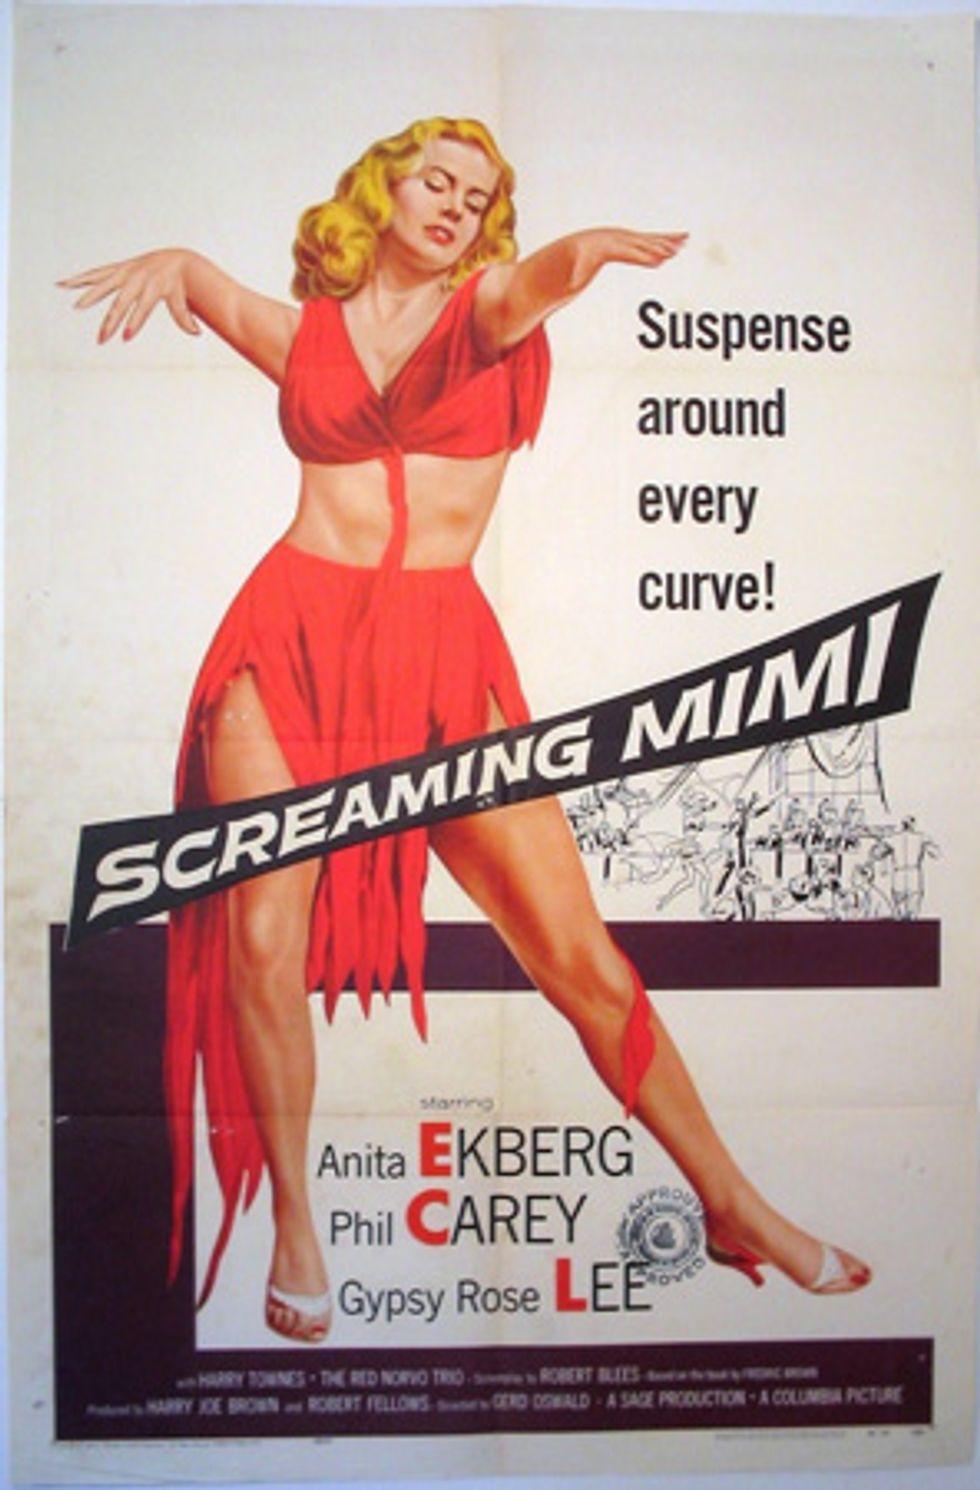 Screaming Mimi On DVD!